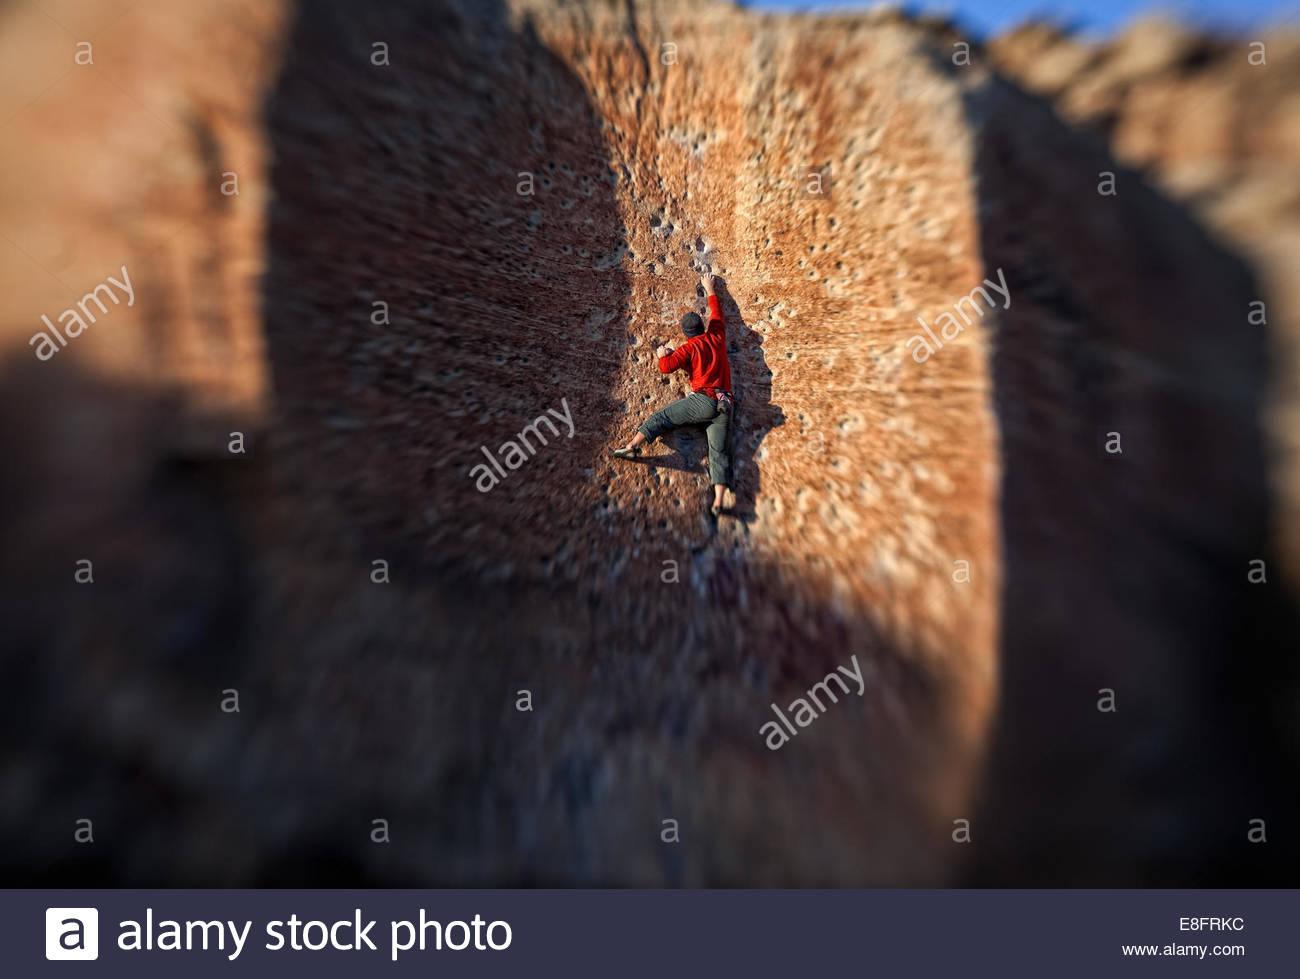 USA, Colorado, Mesa County, Grand Junction, Rear view of rock climber - Stock Image